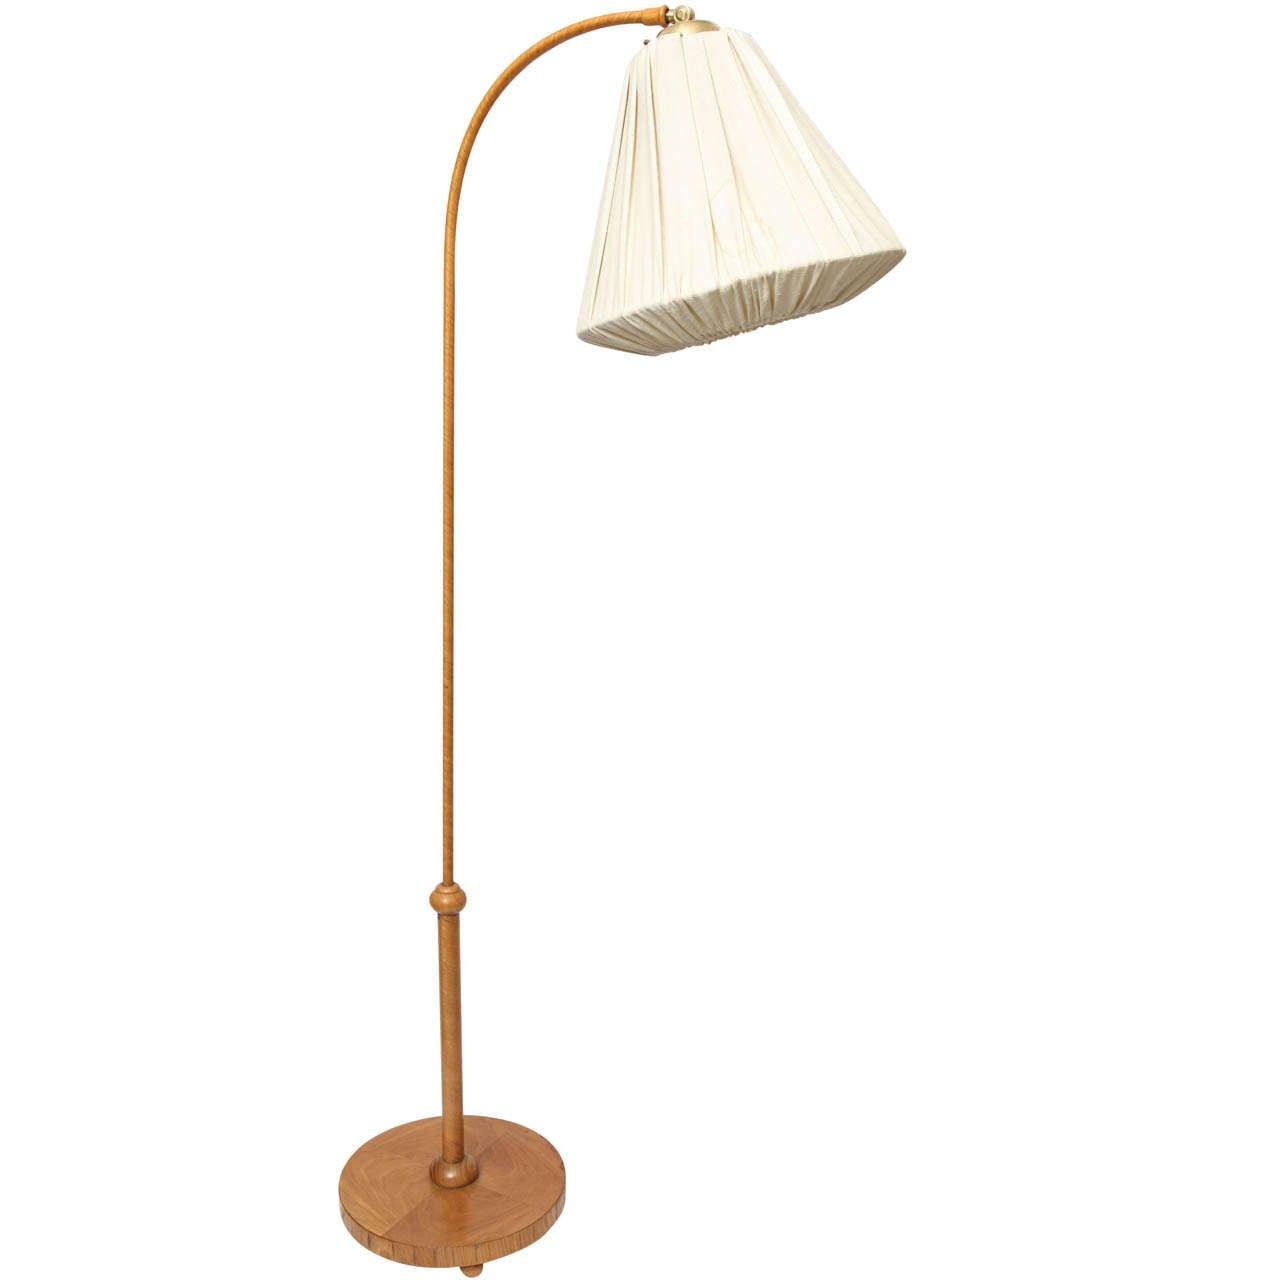 A 1950 39 s modernist austrian floor lamp at 1stdibs for 1950s floor lamps